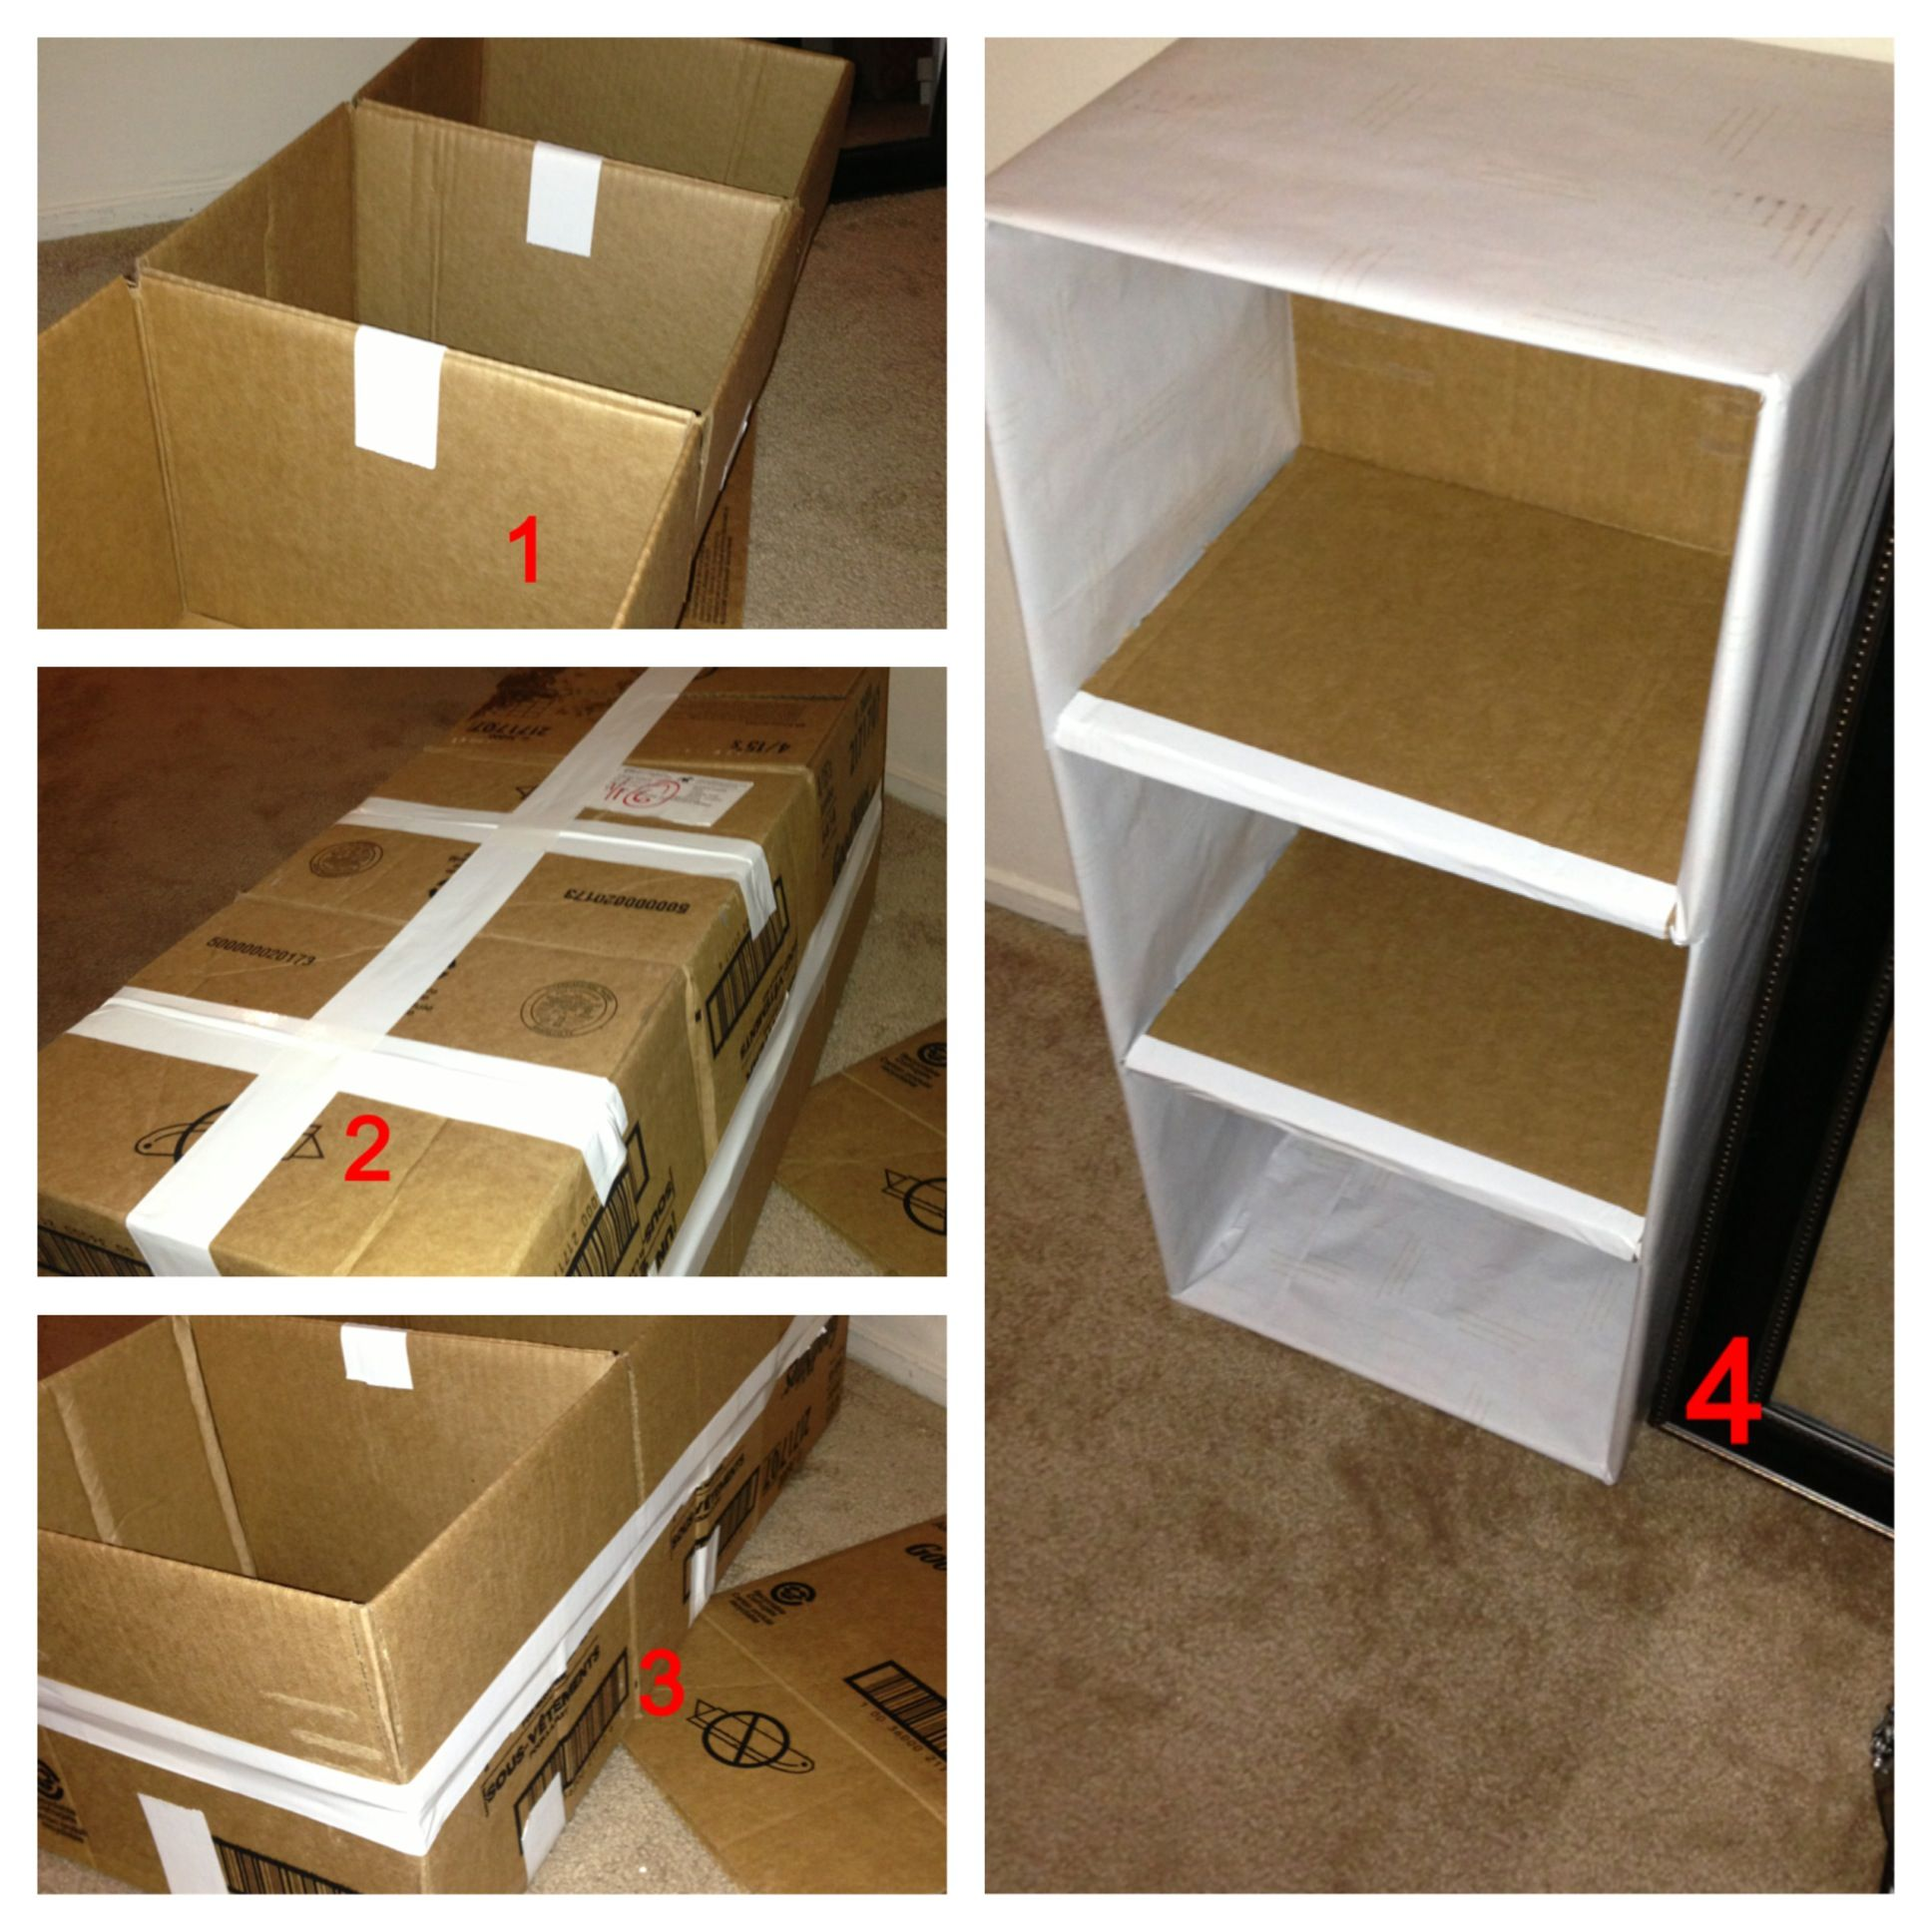 Diy 3 tier shelf from cardboard boxes creative for Diy magazine box